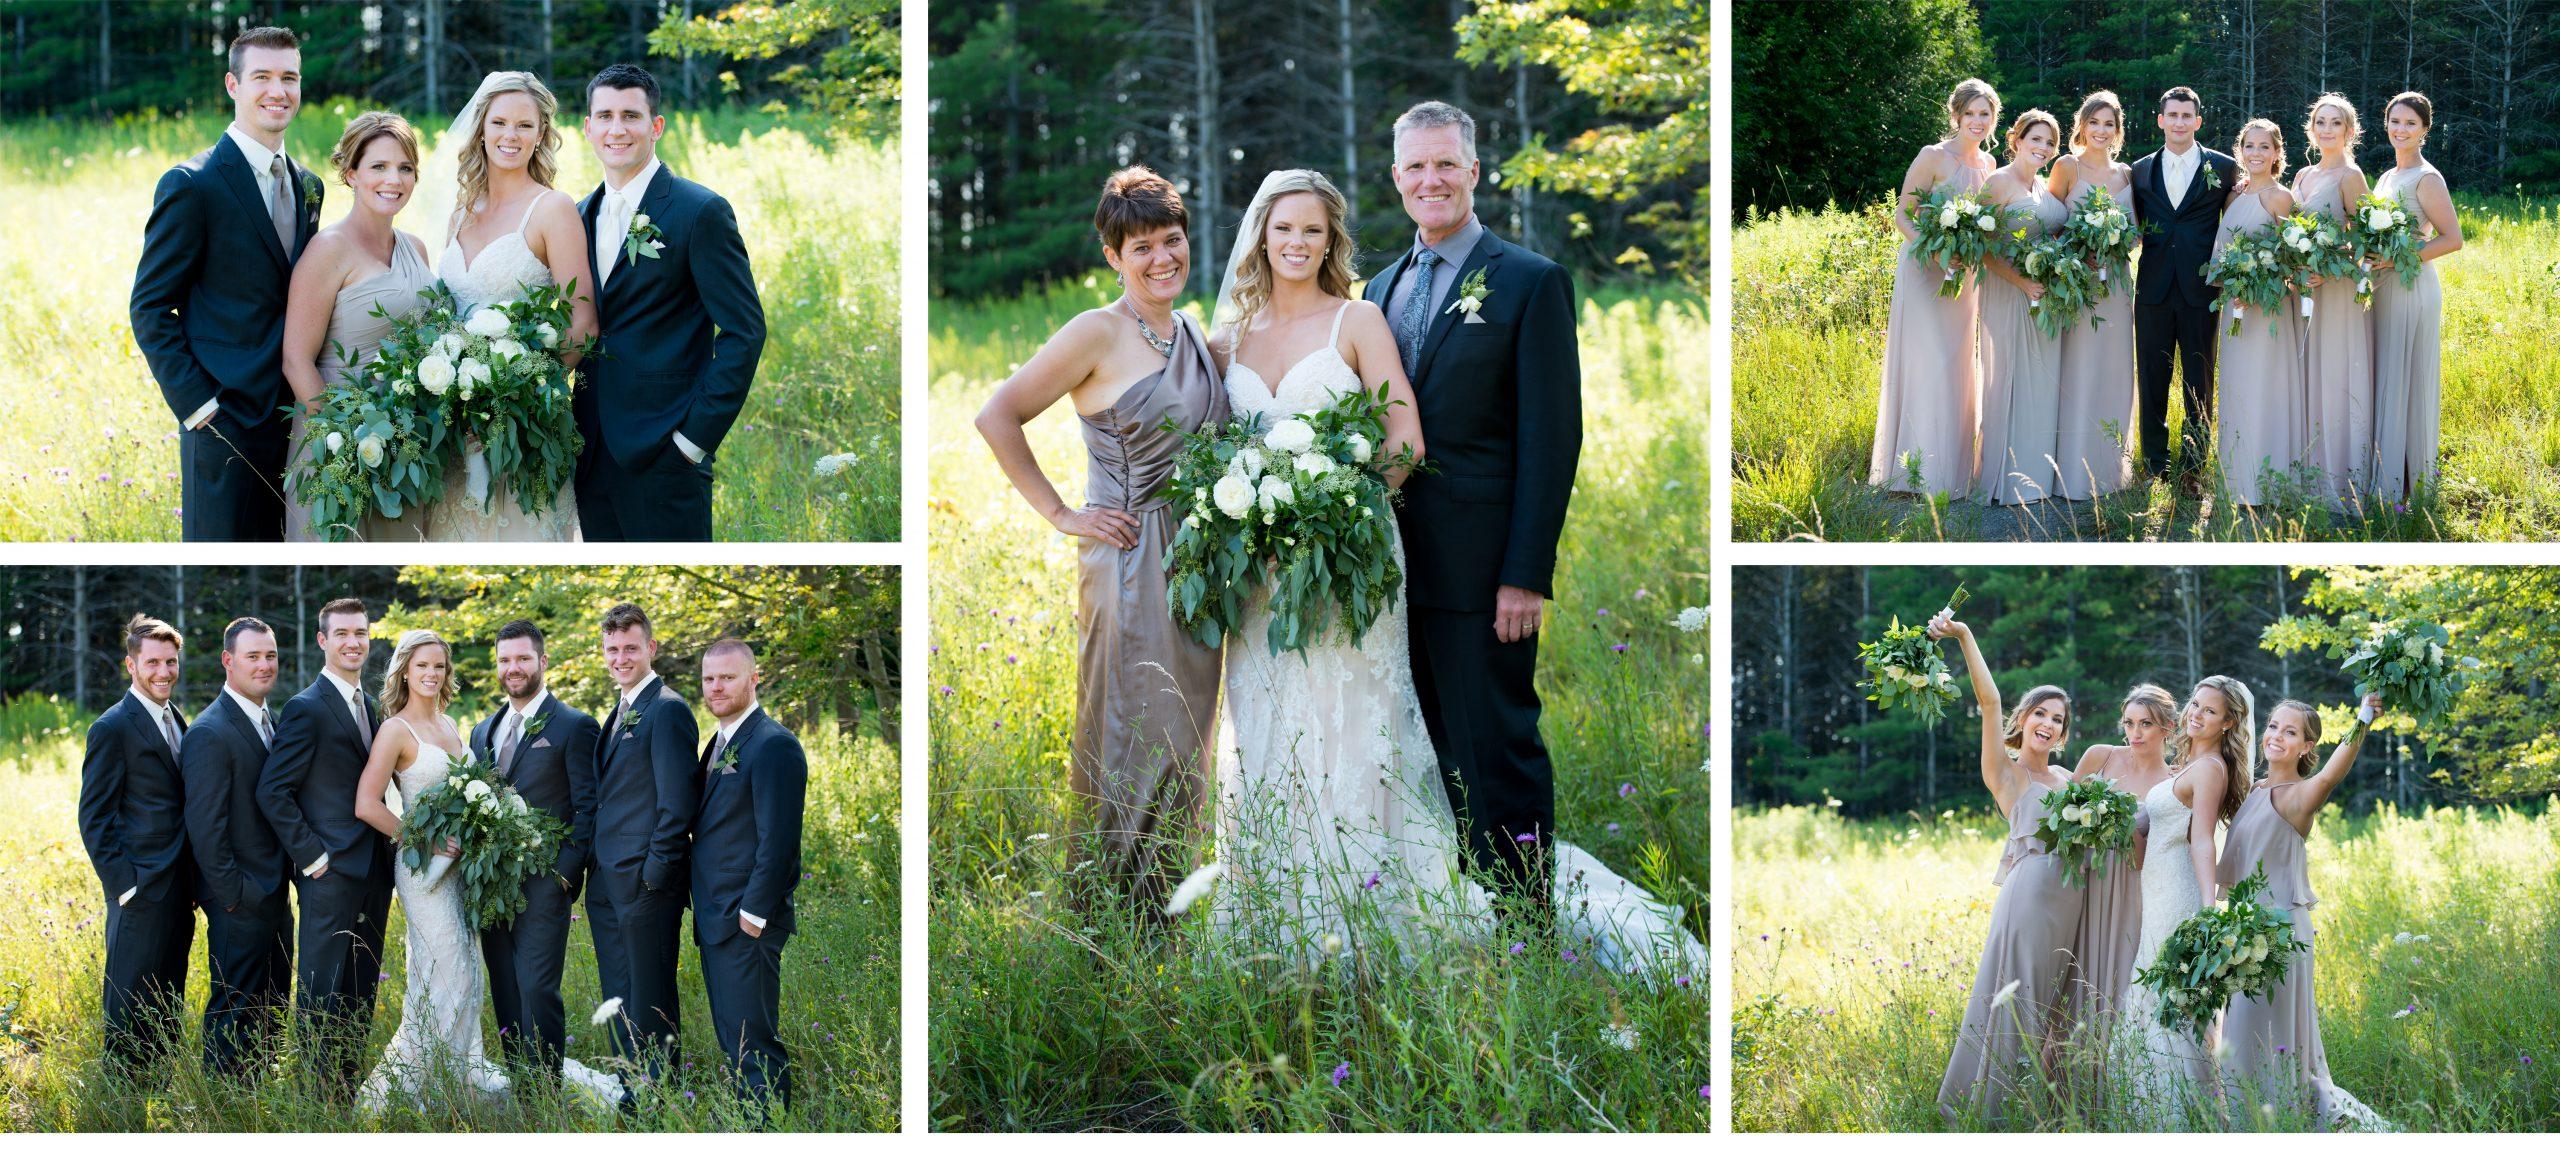 Arthur_wedding_photographer